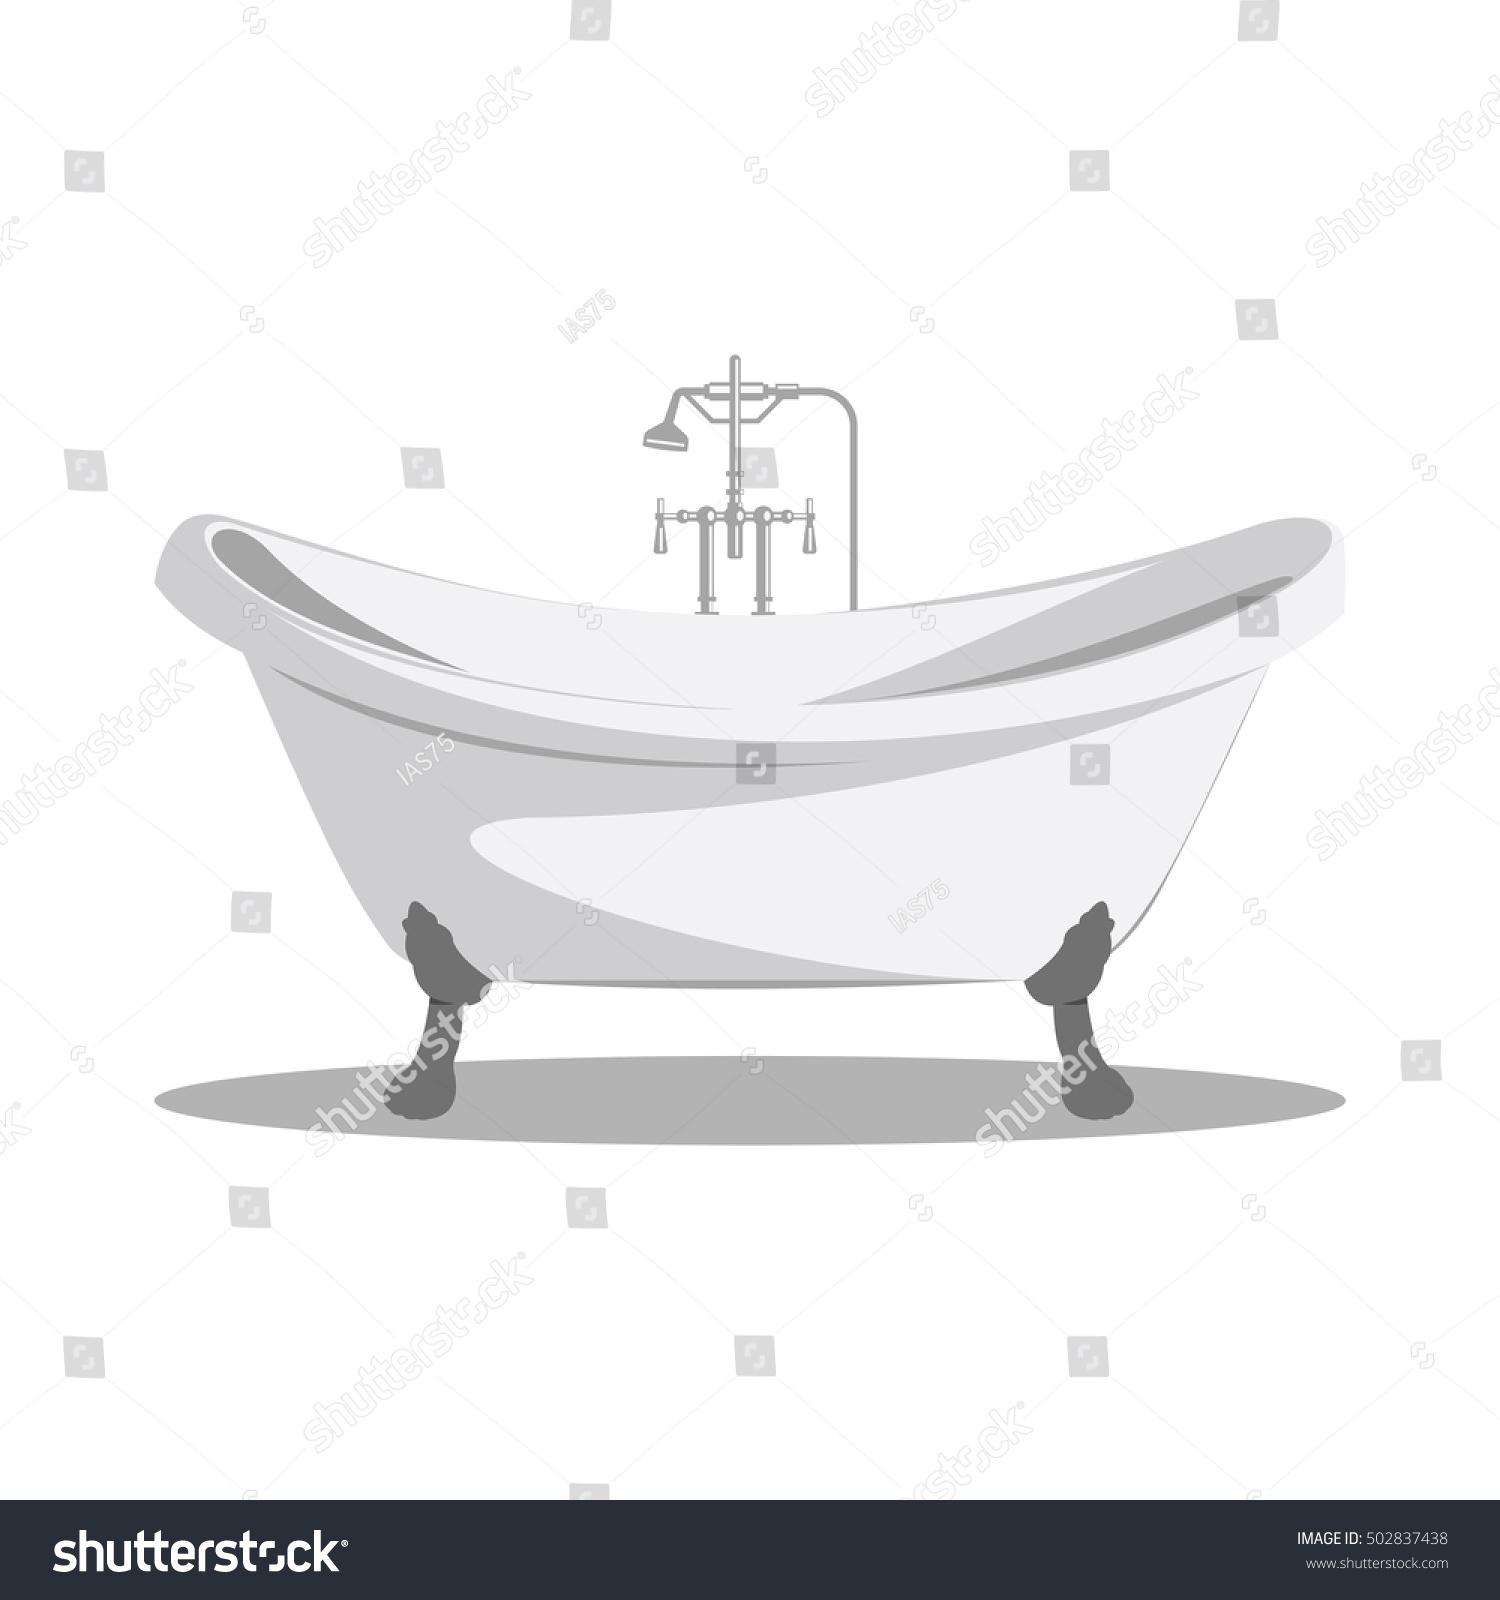 bathtub cartoon. Cartoon retro bathtub icon white with arms and legs shadow at the  bottom Vector Retro Bathtub Icon White Arms Stock 502837438